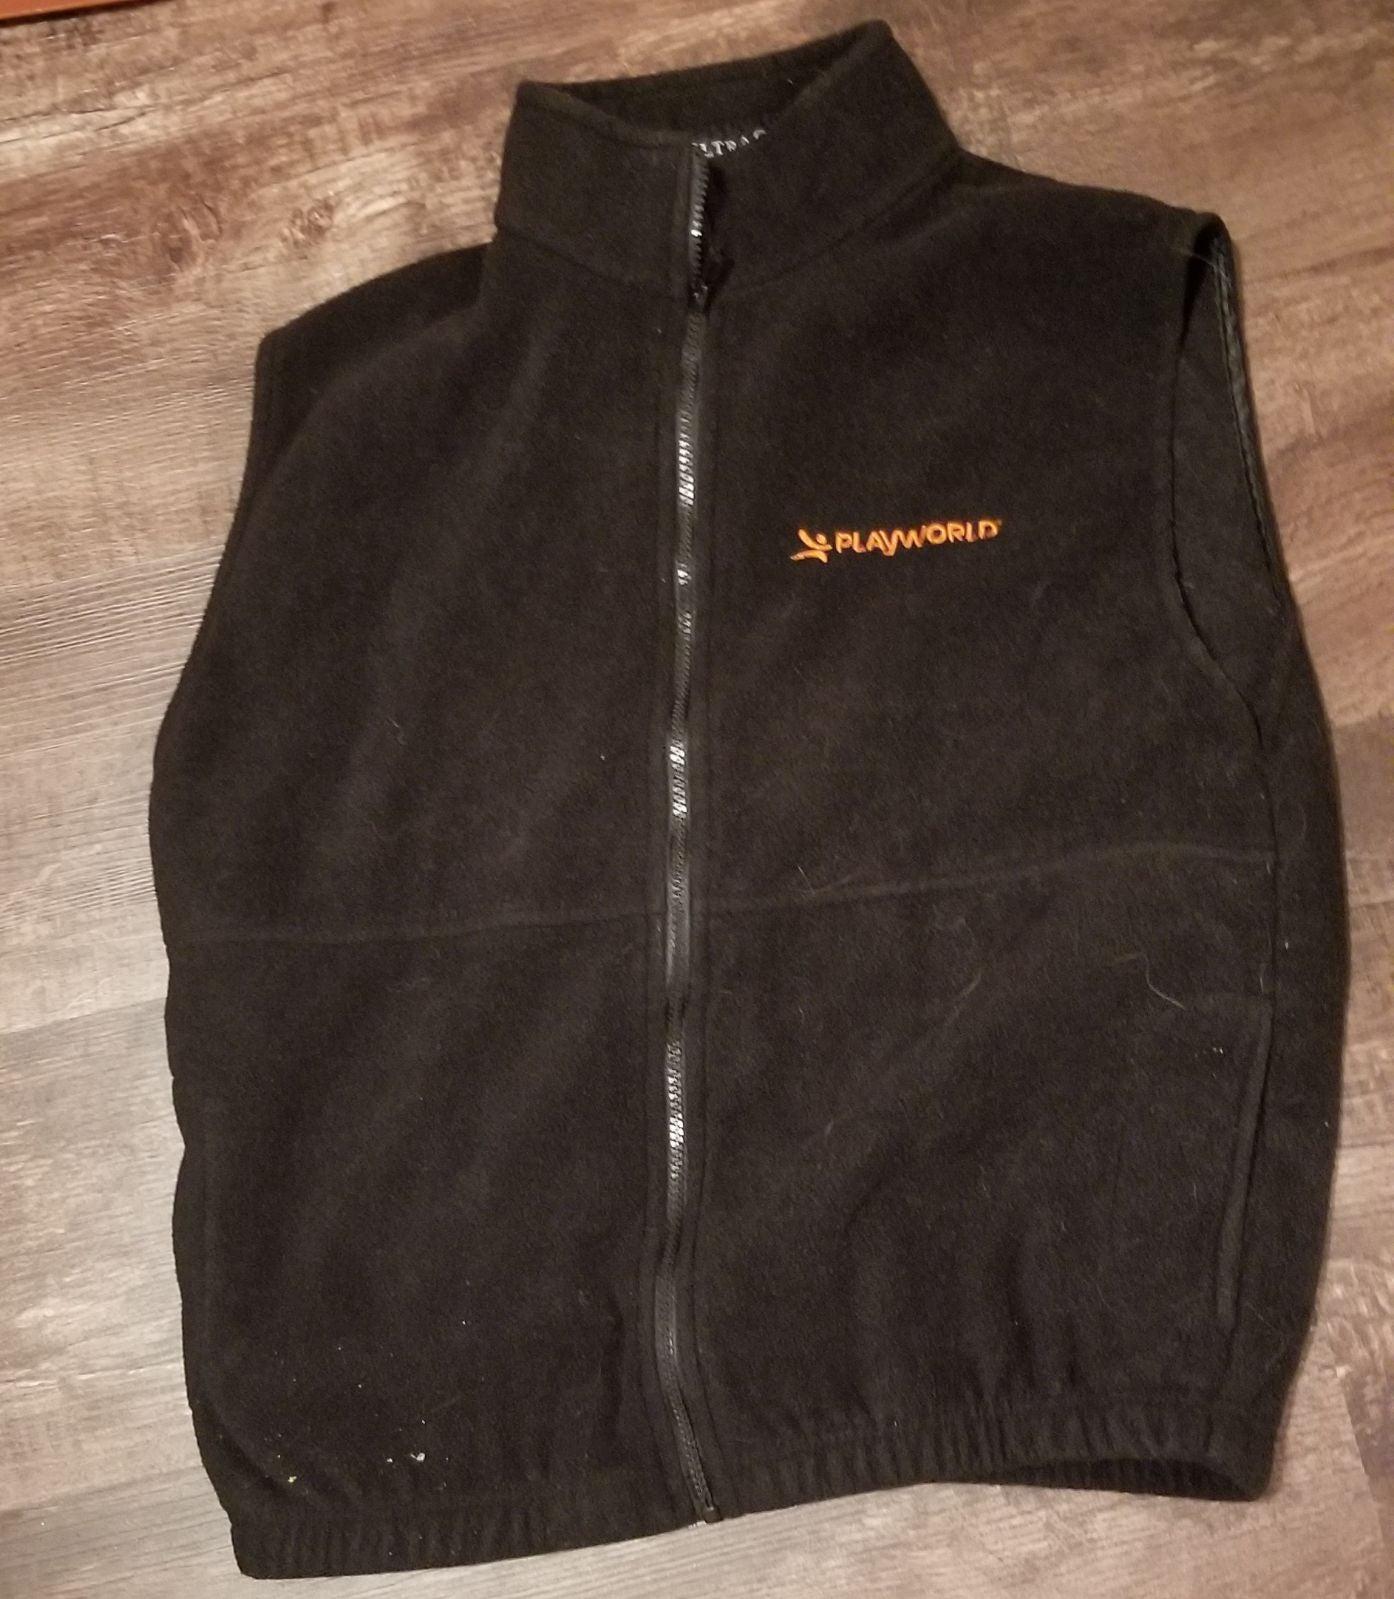 3/$20 Mens play world fleece vest